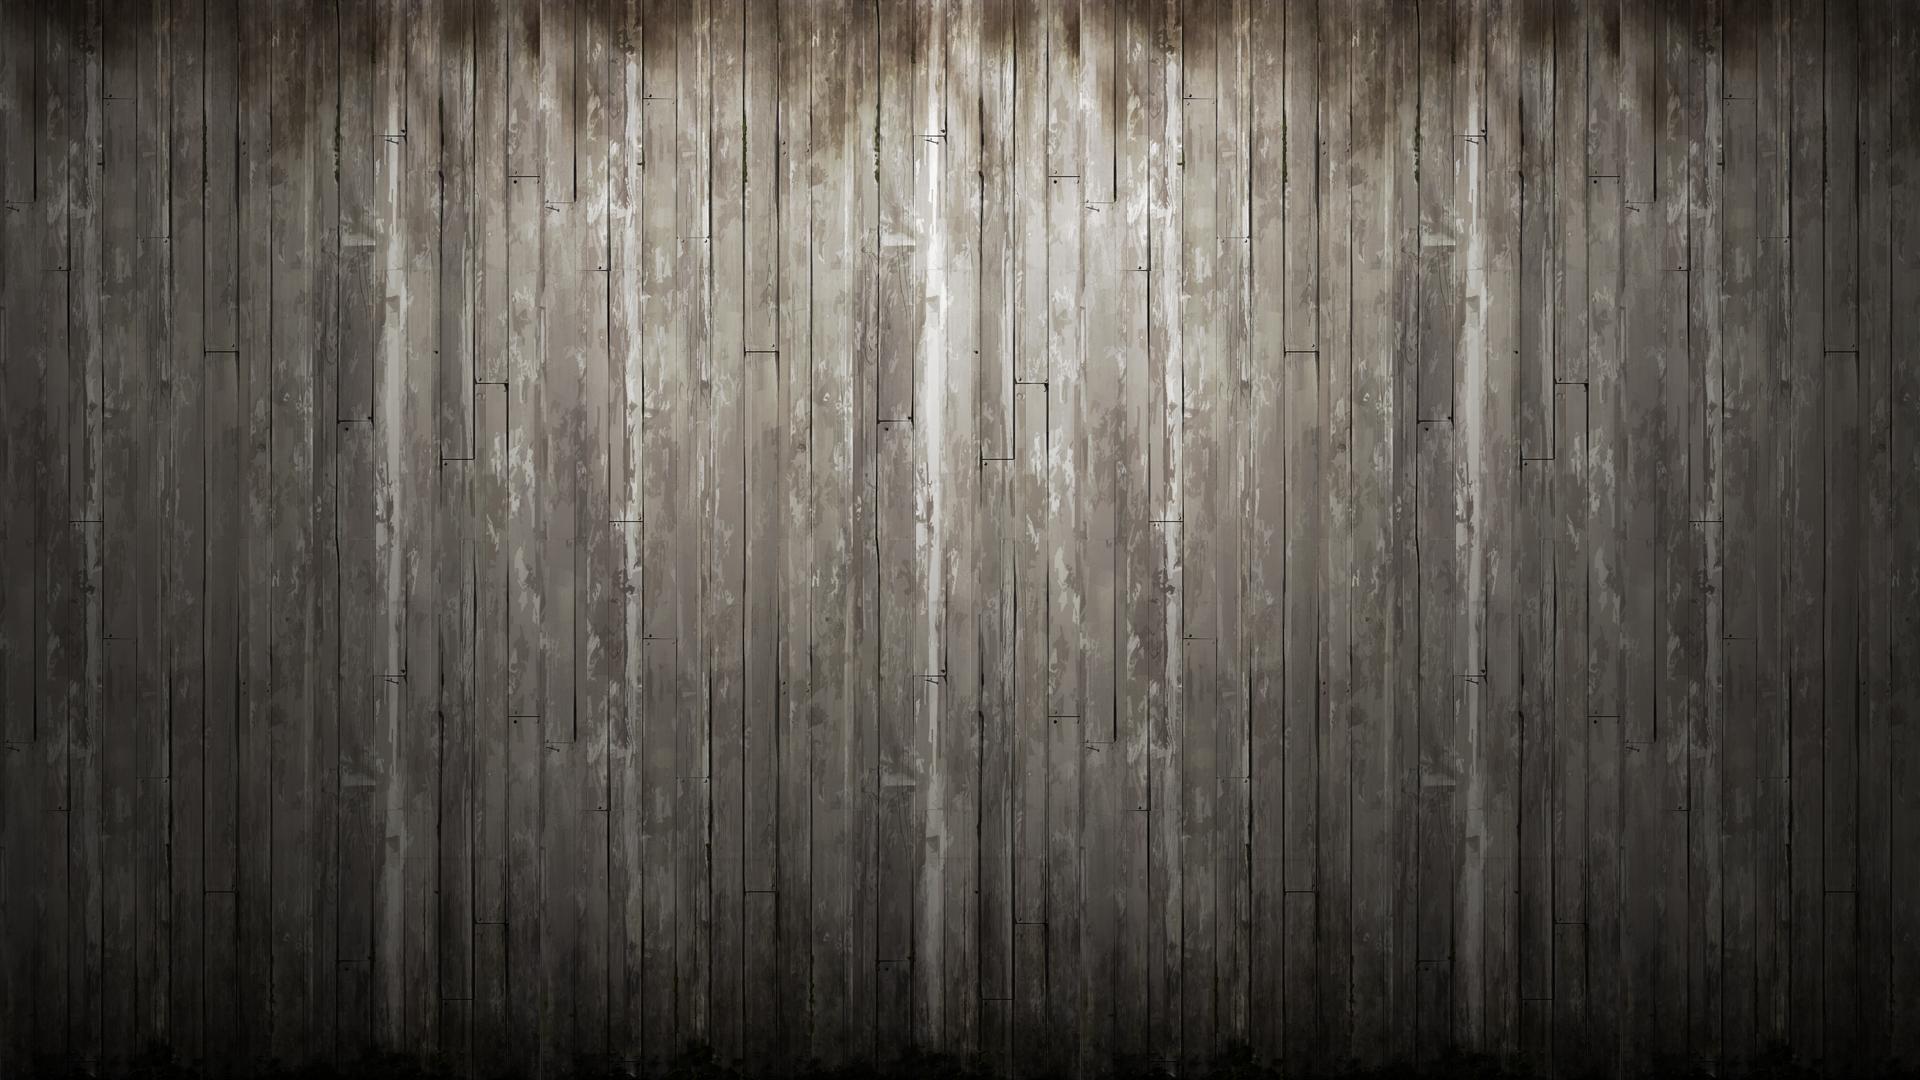 Wood Texture Wallpaper 1920x1080 Wood Texture 1920x1080